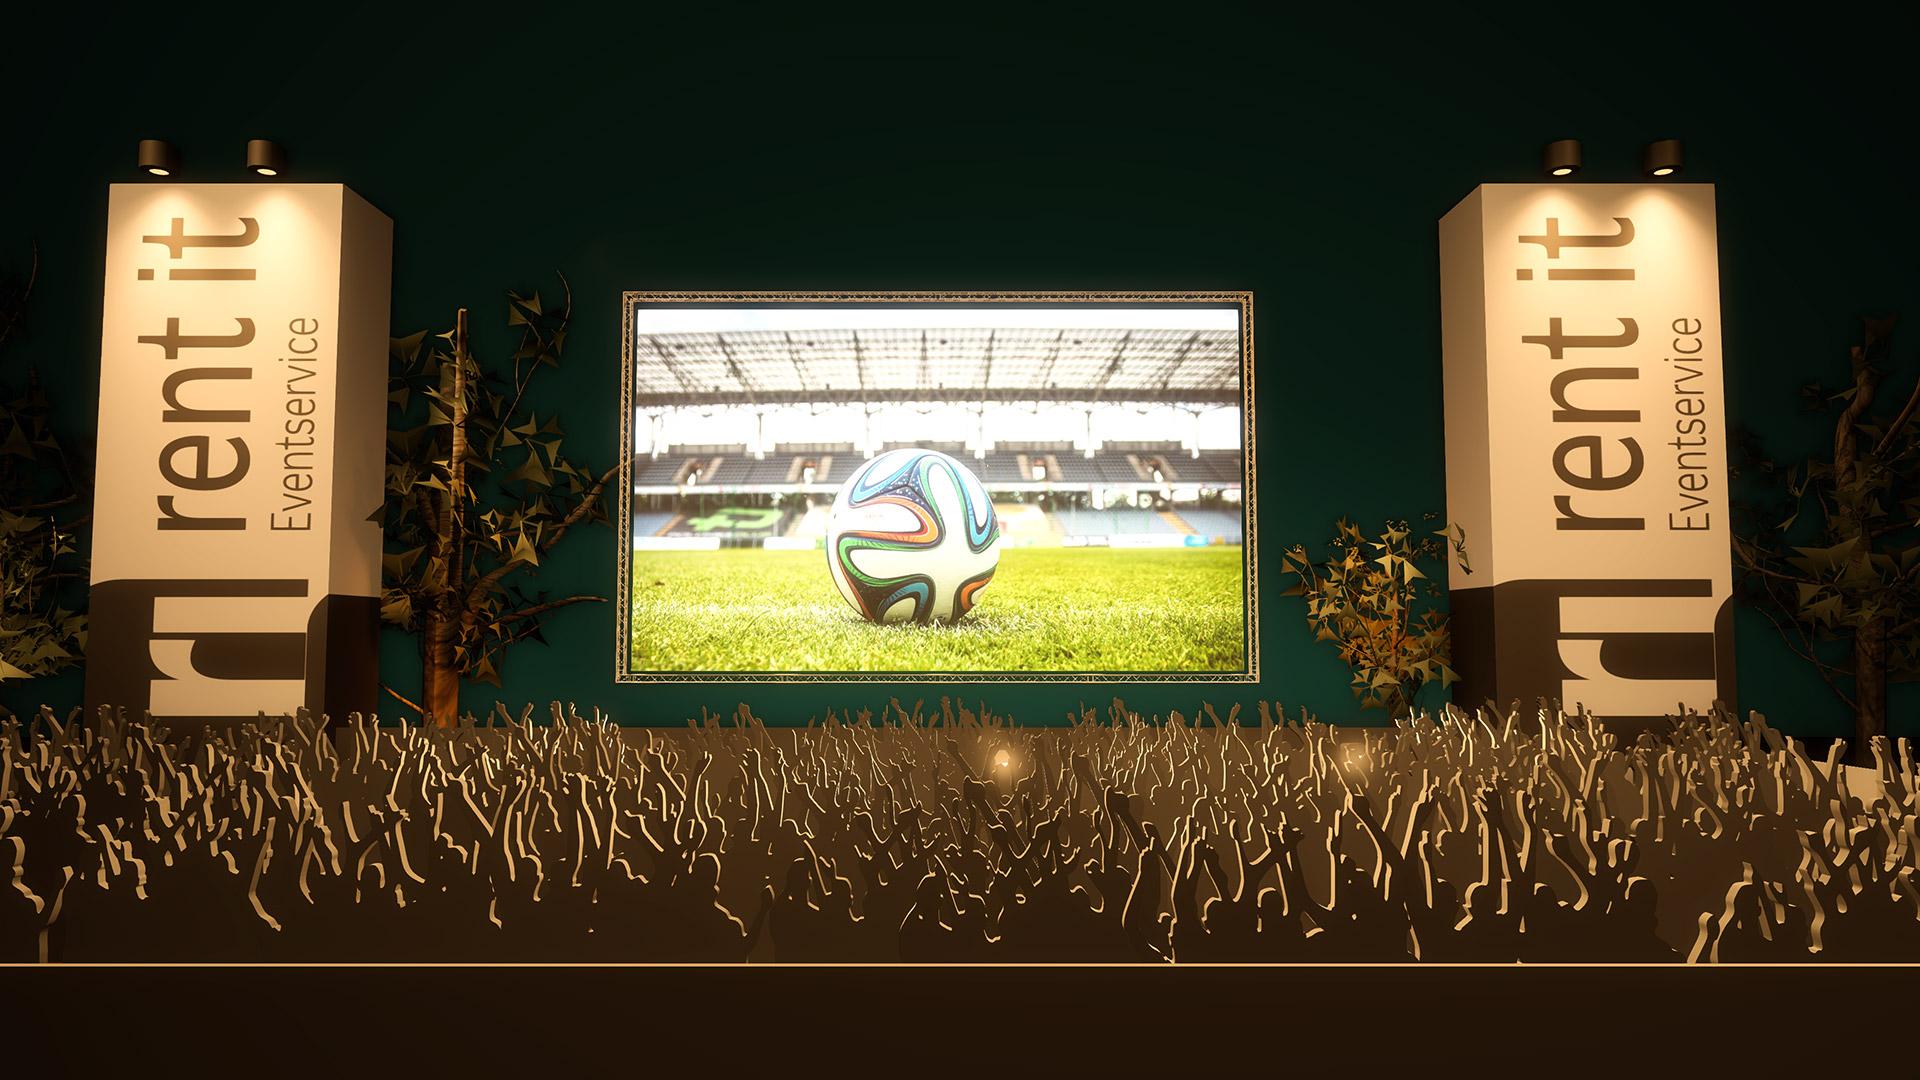 Foto: https://www.pexels.com/de-de/foto/feld-gras-sport-boden-47730 / Rendering: Max Schmalenberger / Konzept: rent it